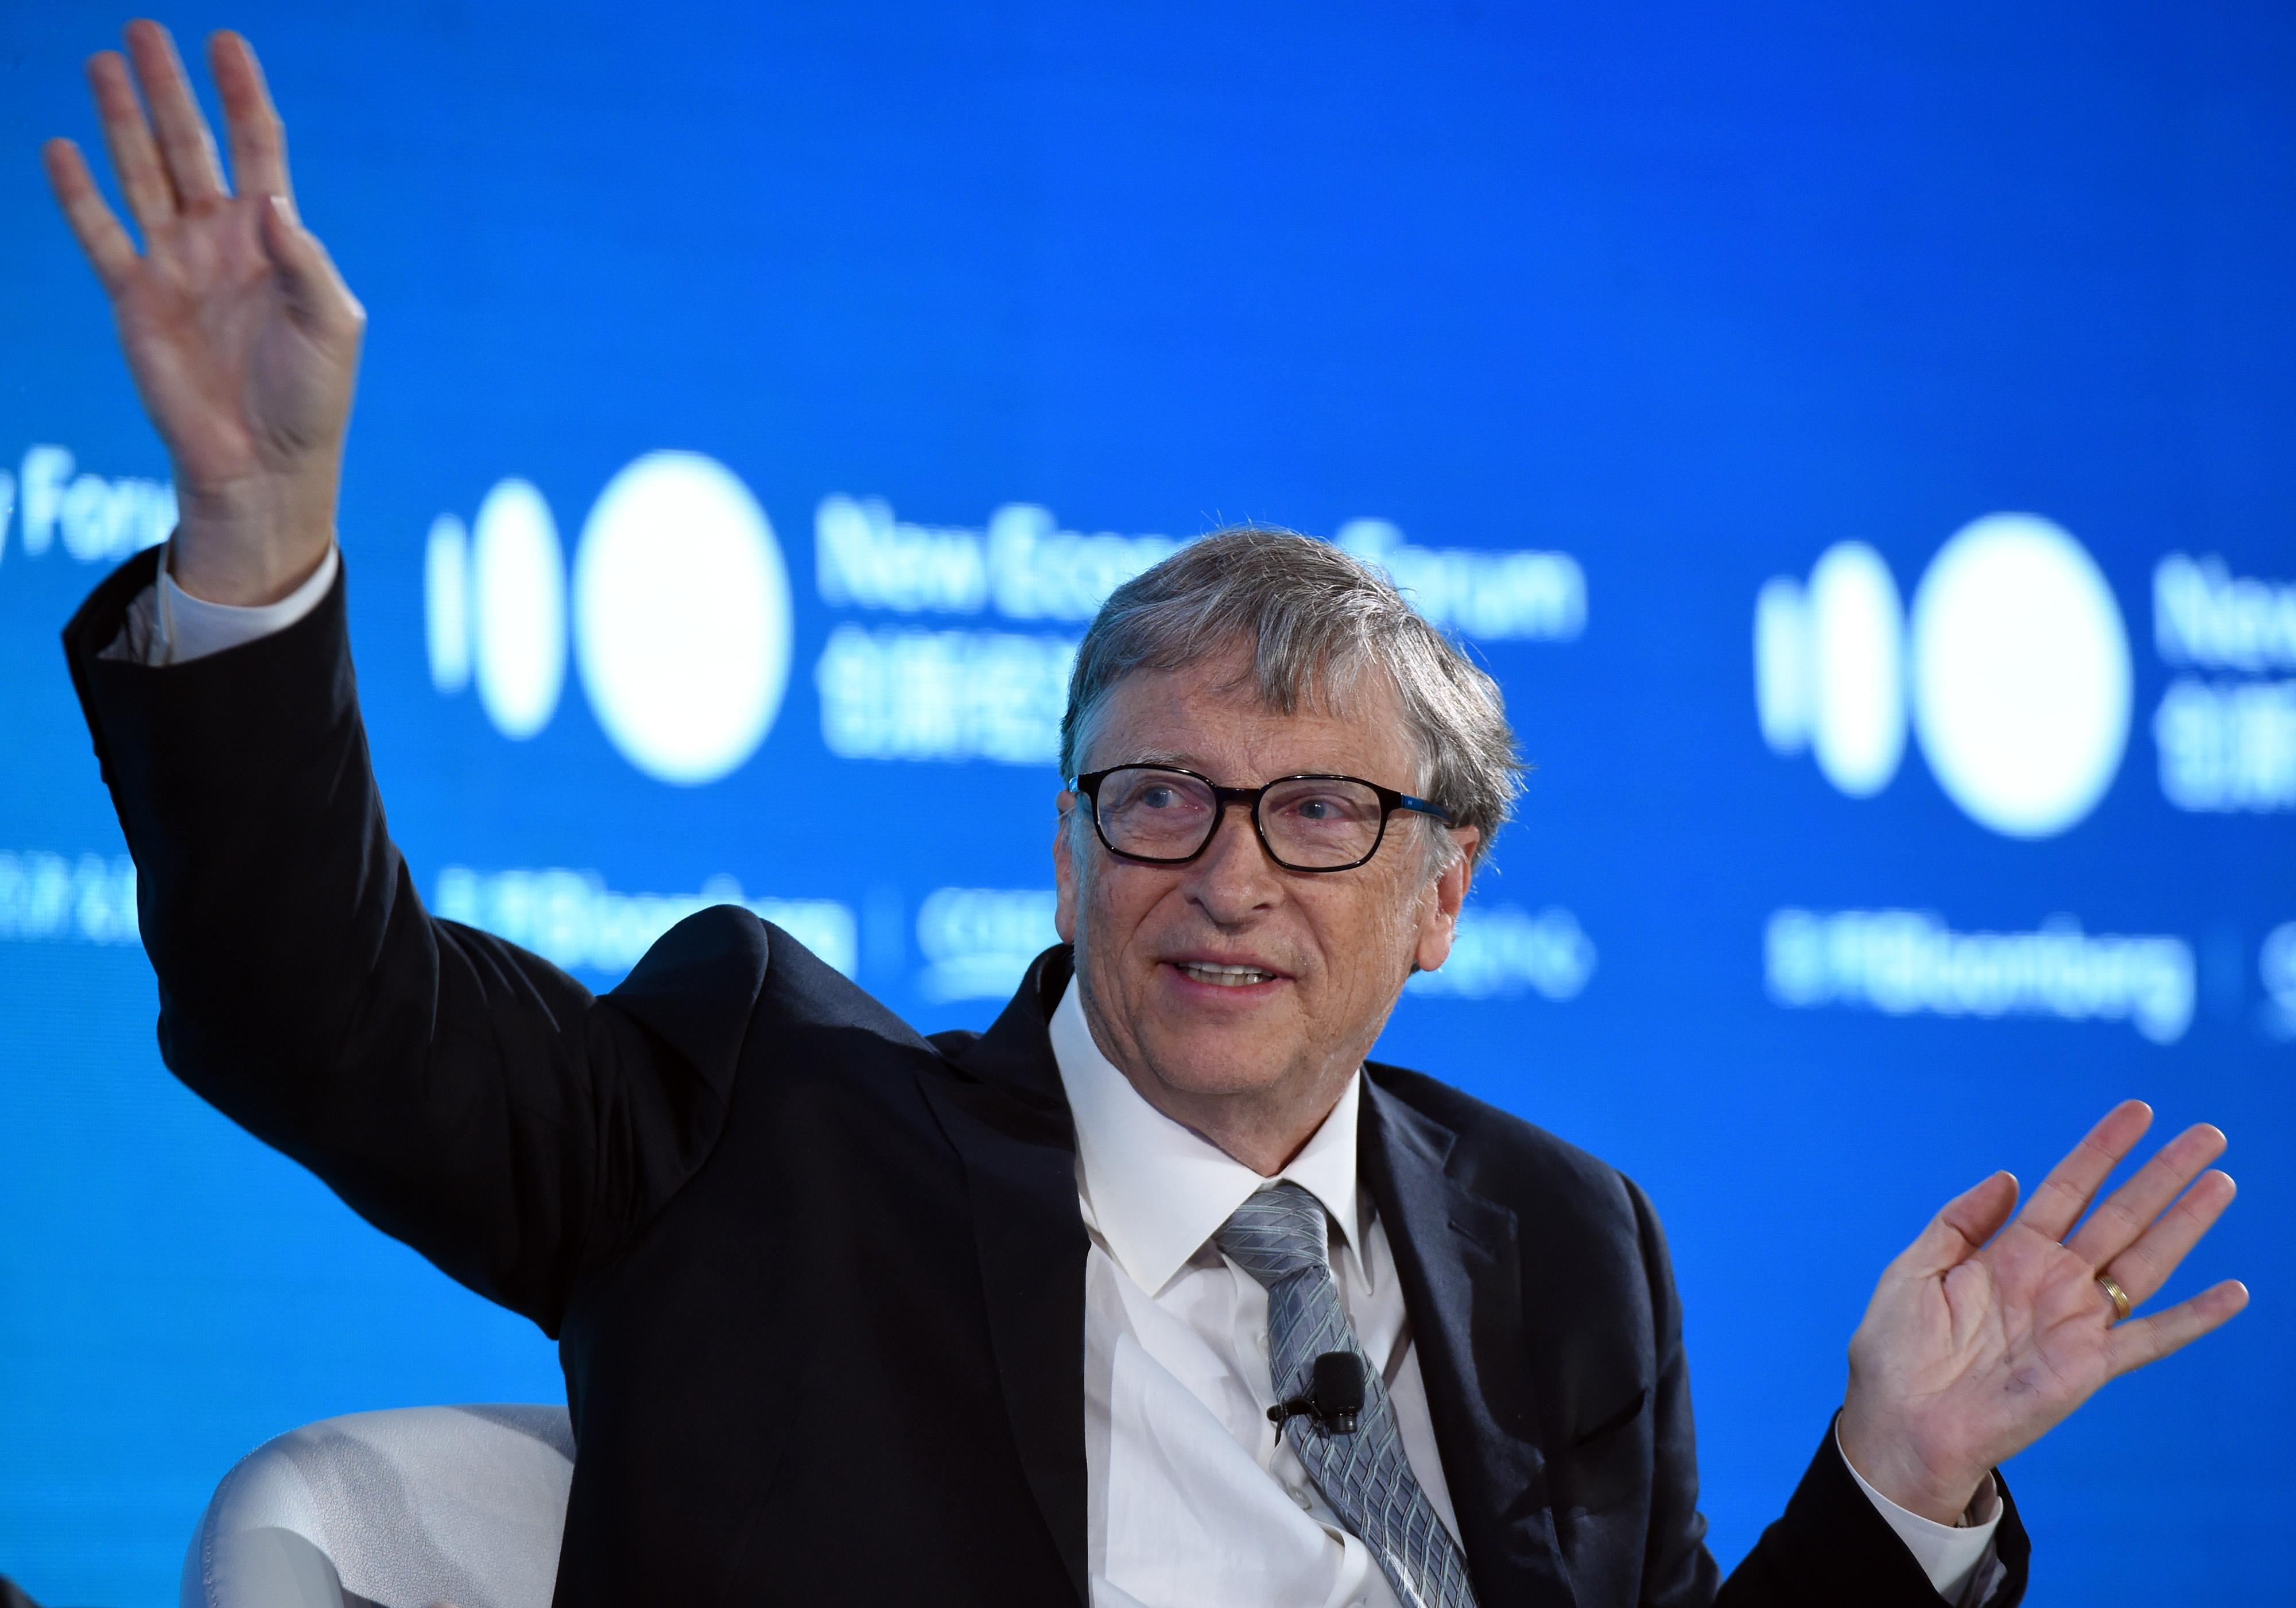 Bill Gates leaving Microsoft board represents an end of an era ...